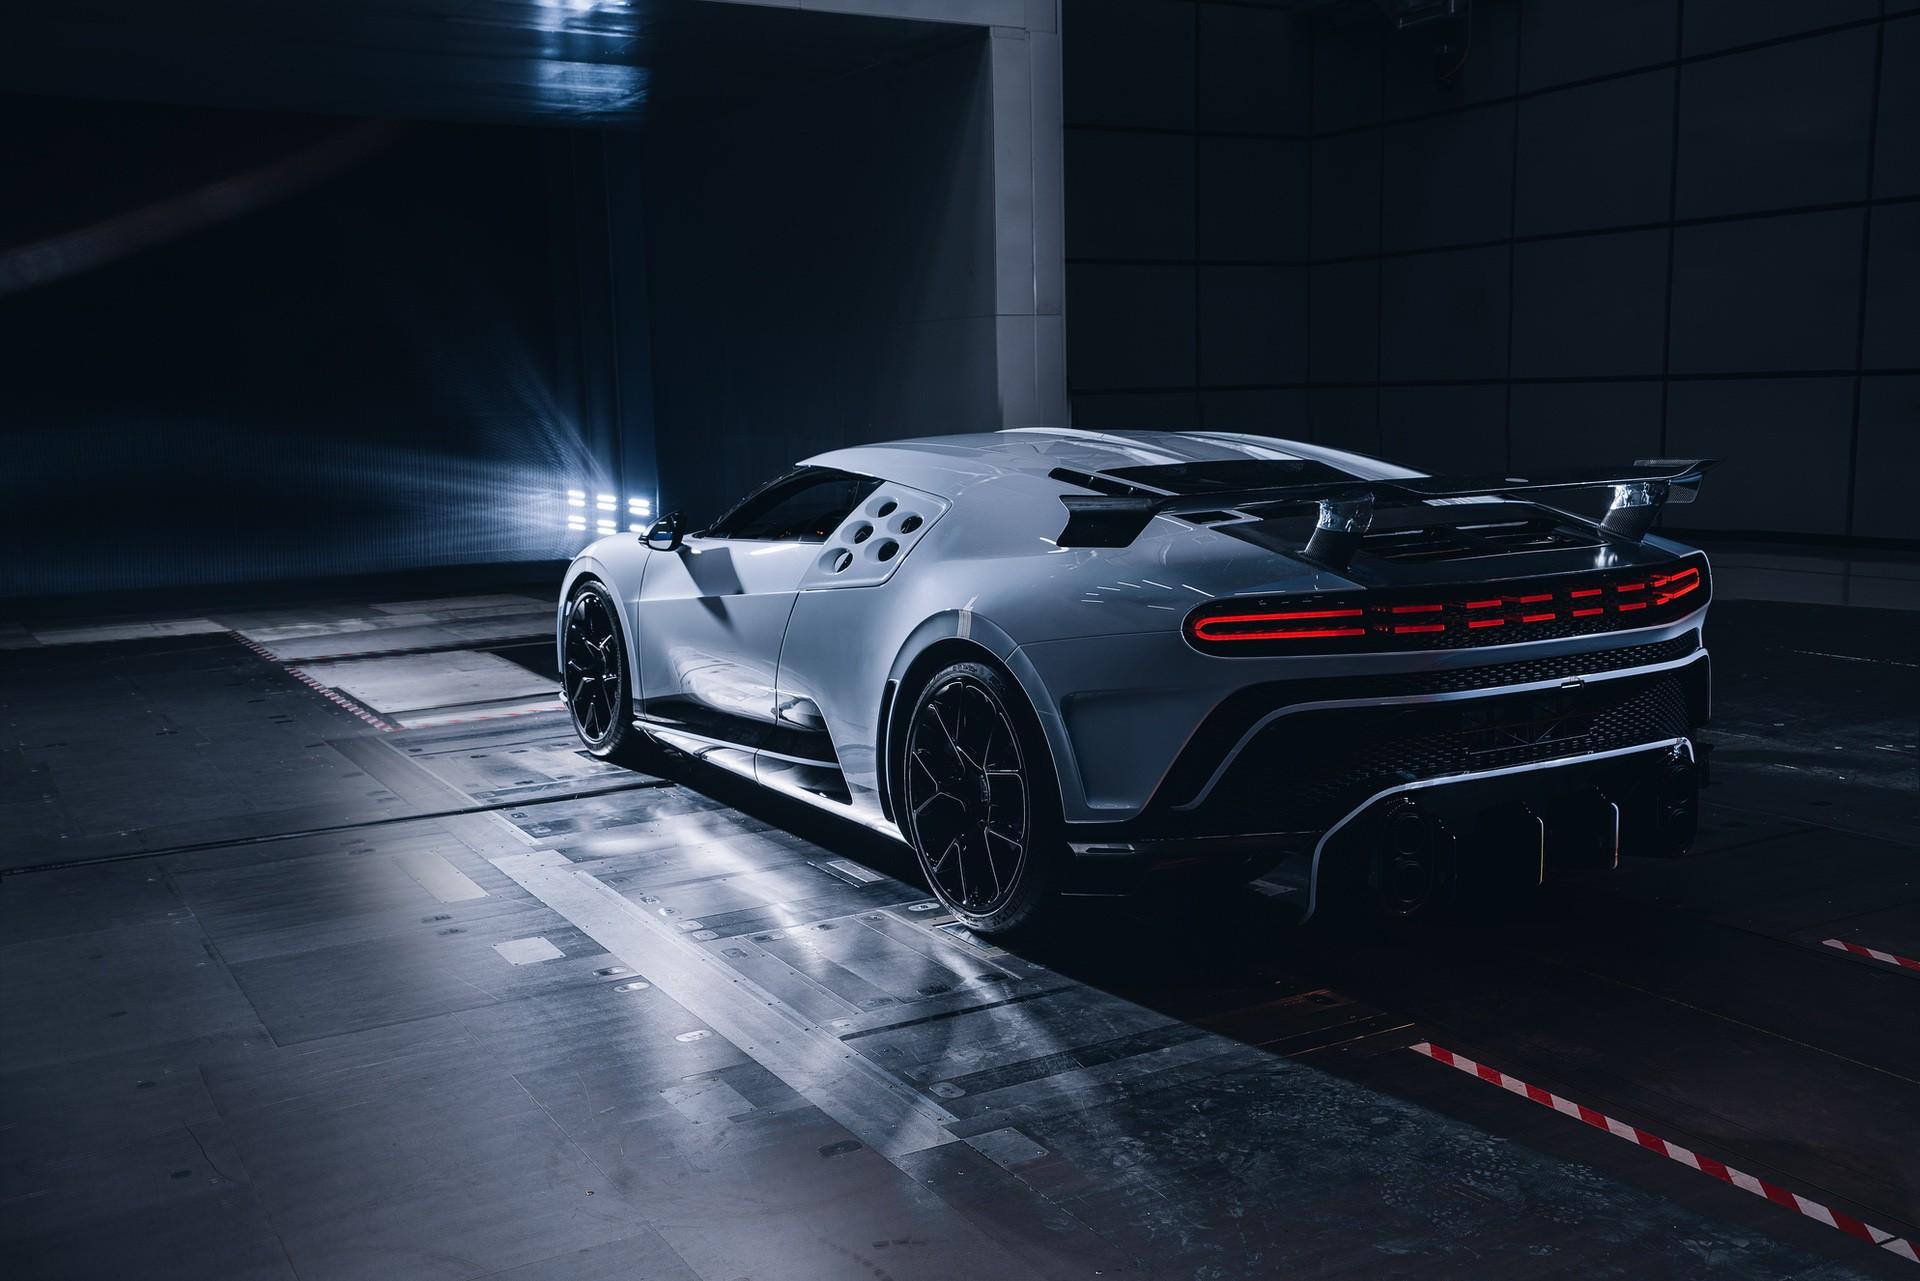 Bugatti_Centodieci_windtunnel_tests-0000